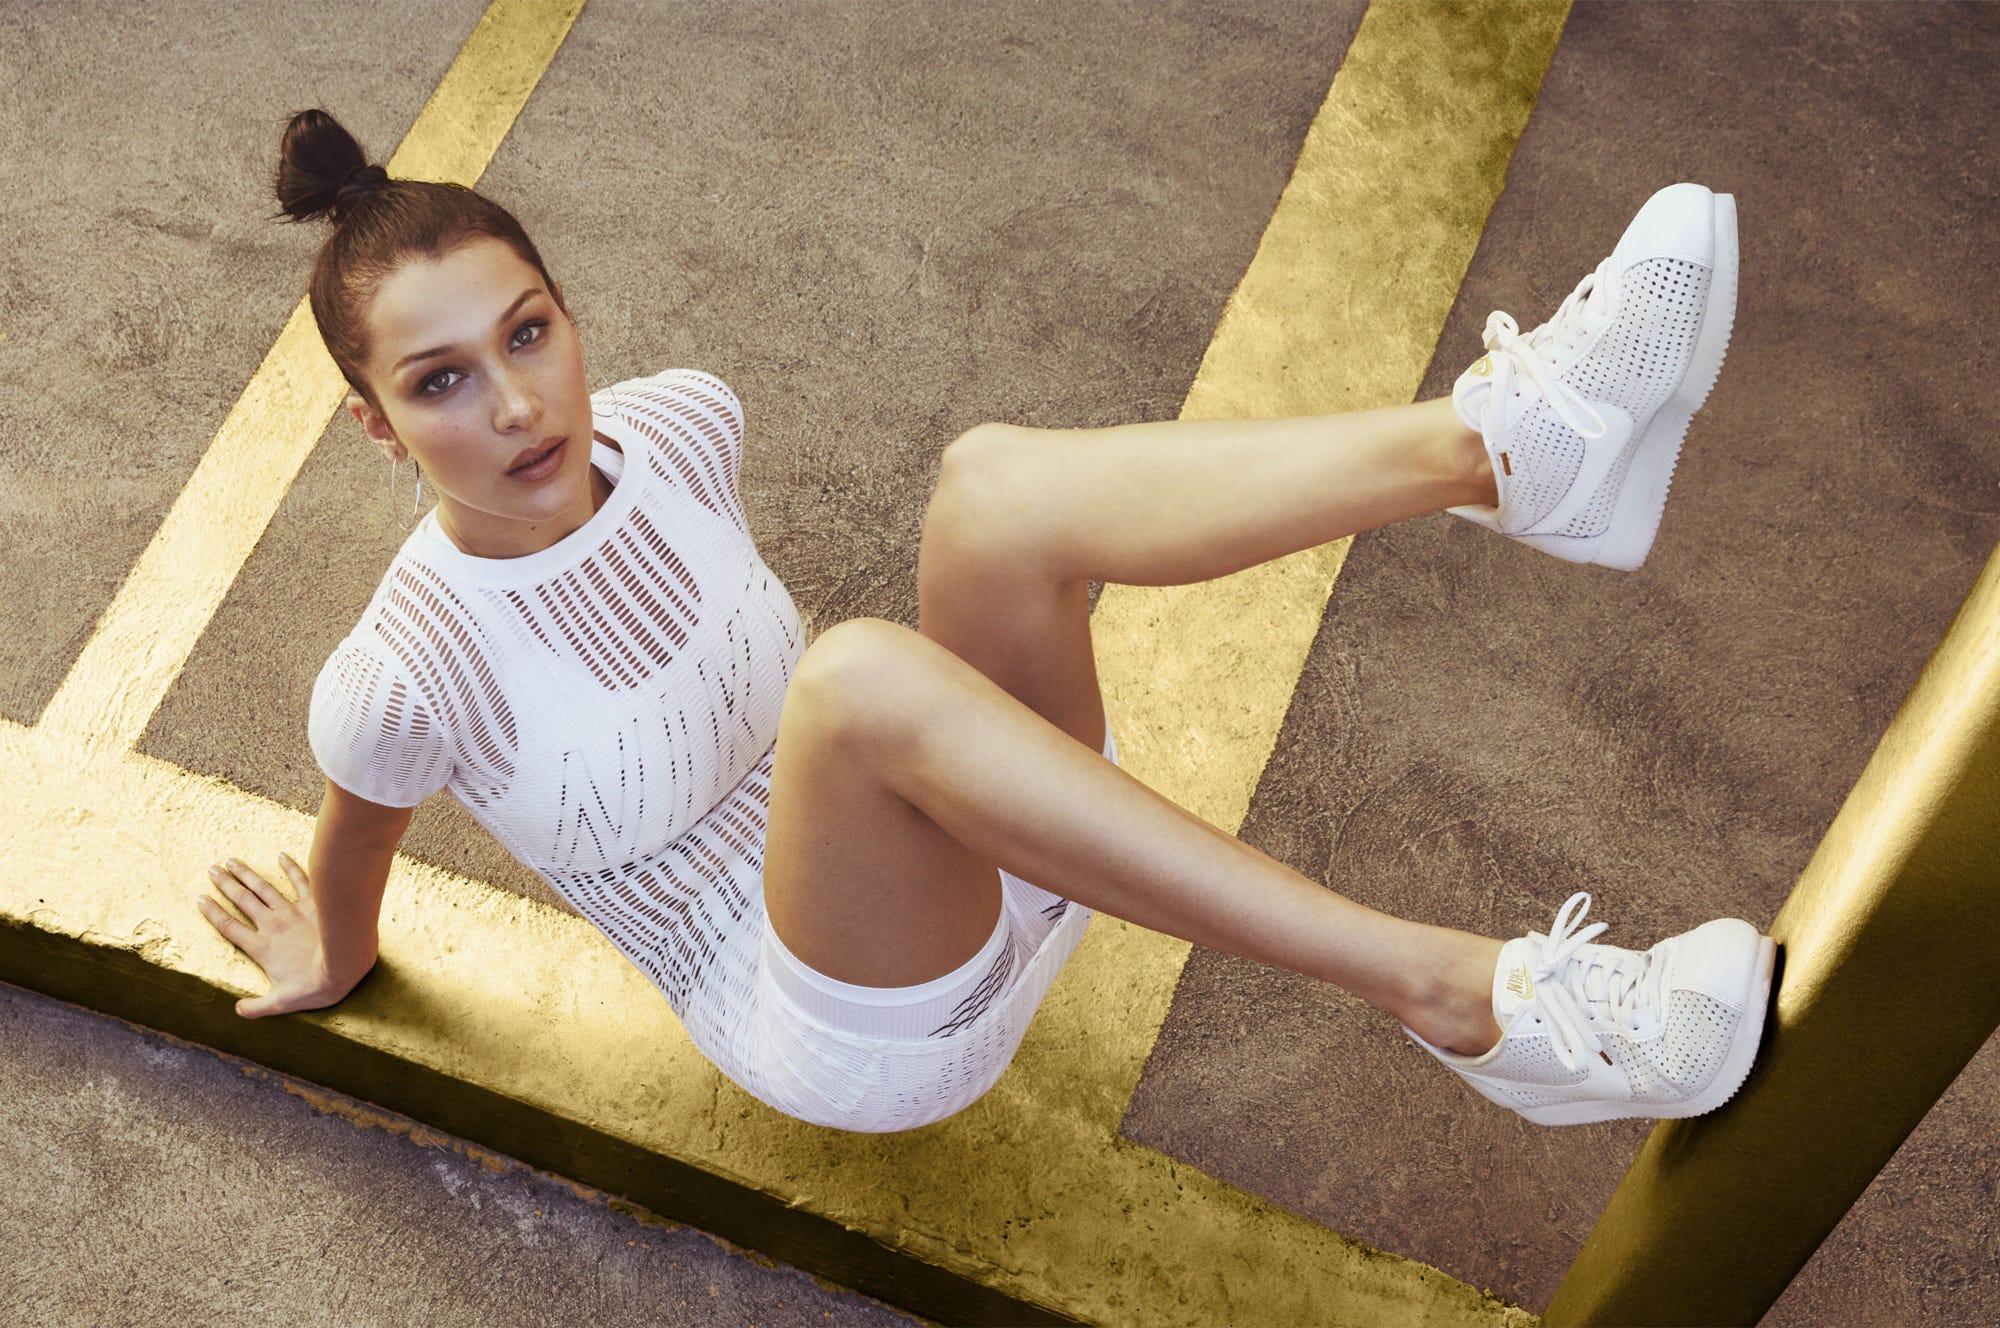 Cuarto periódico ¿Cómo  Bella Hadid Nike Cortez White Sneakers LA Outfits